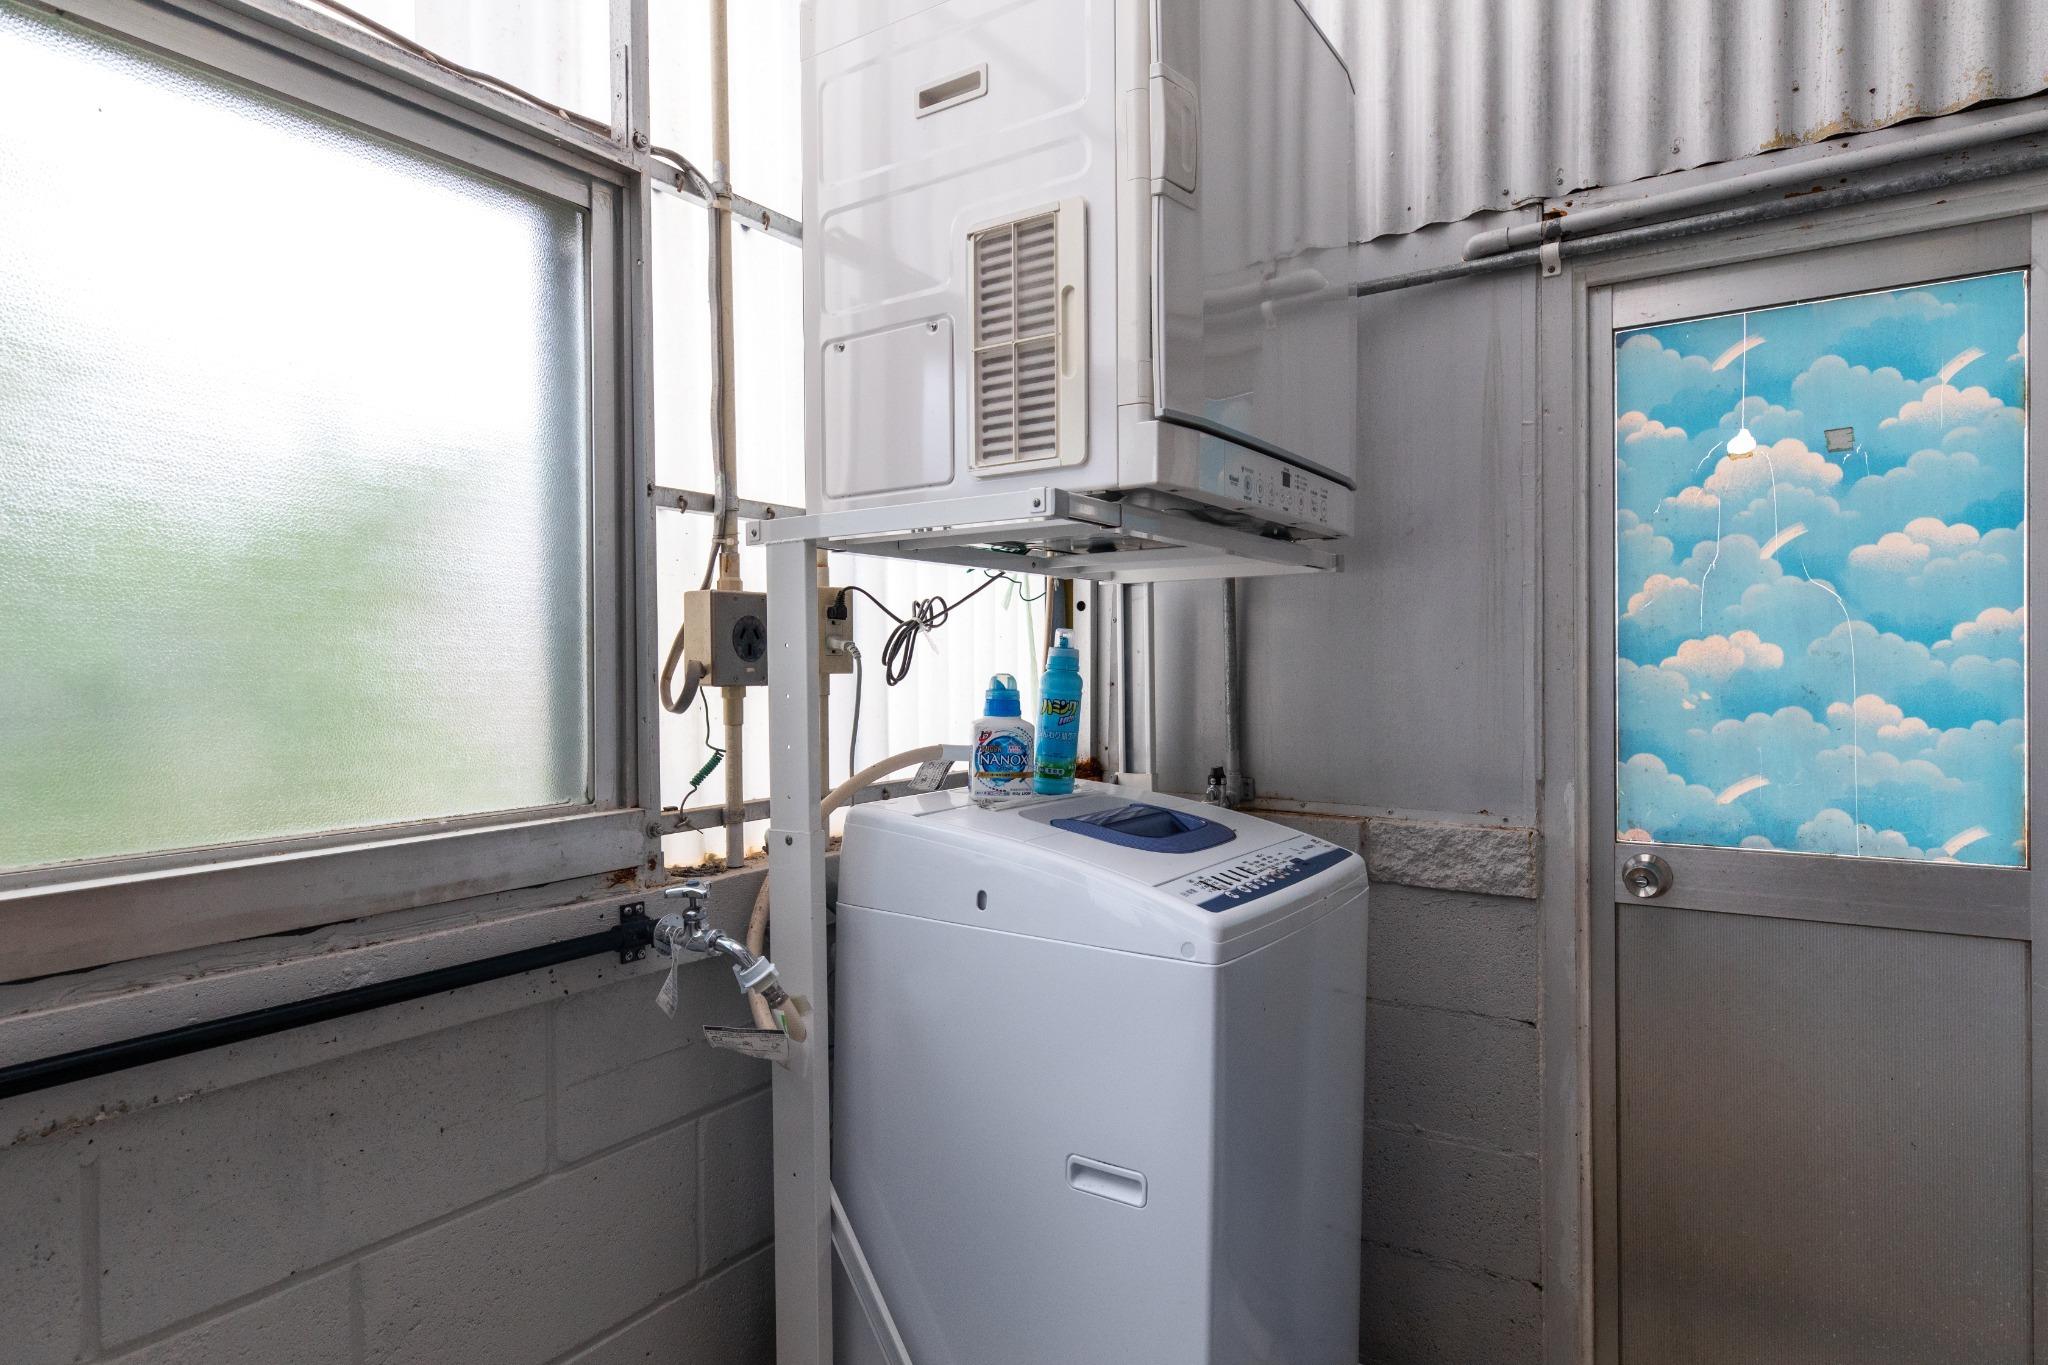 Washing machine and Dryer 洗濯機と乾燥機